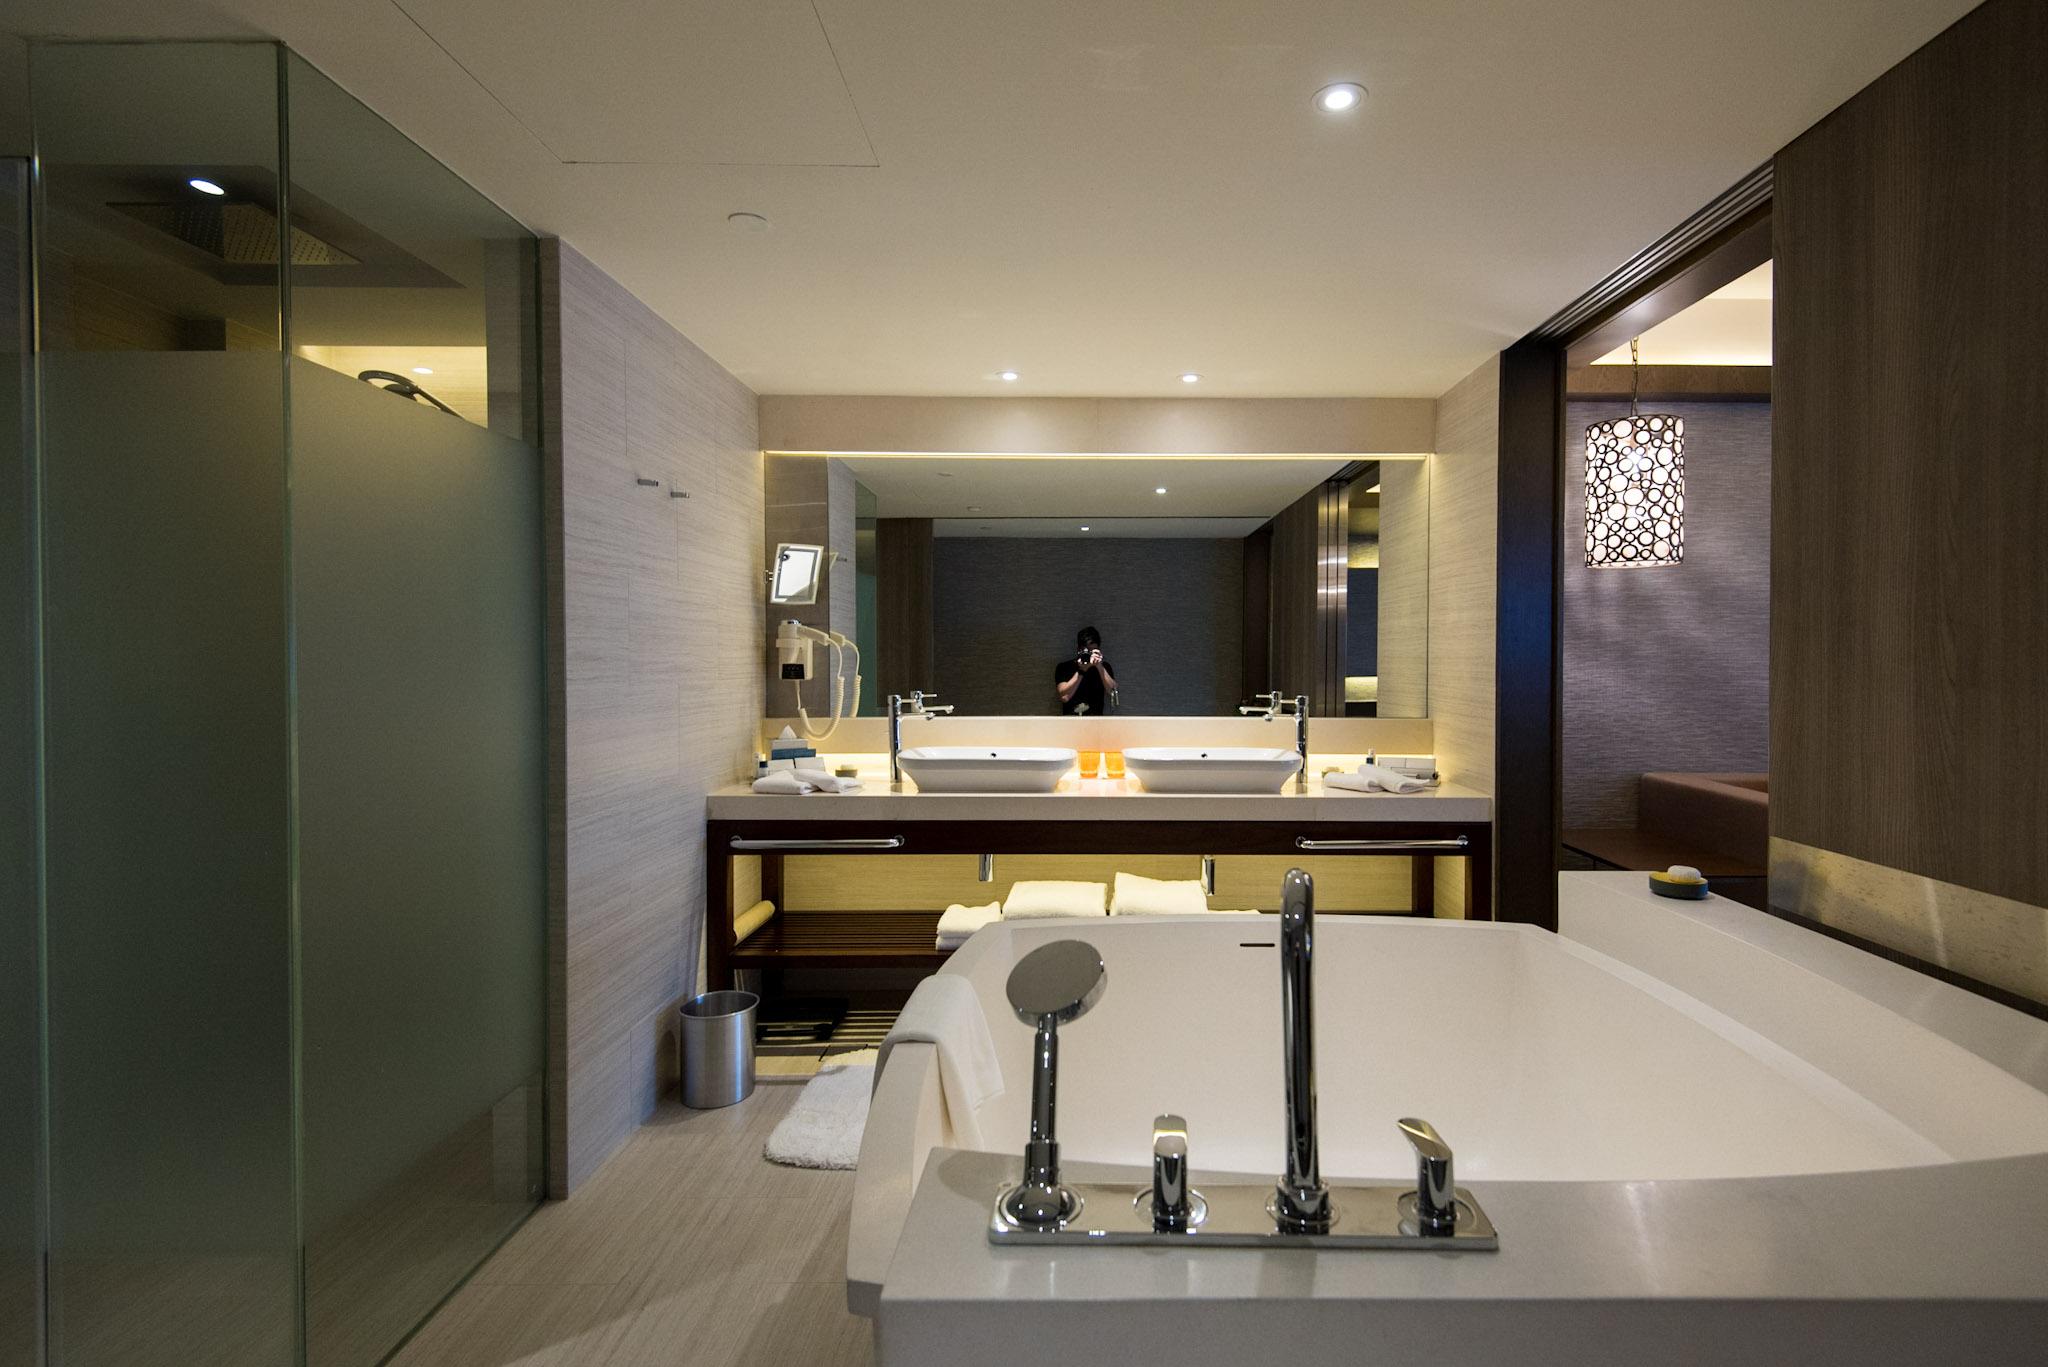 Bathroom    Pacific Harbour Studio - Pan Pacific Singapore